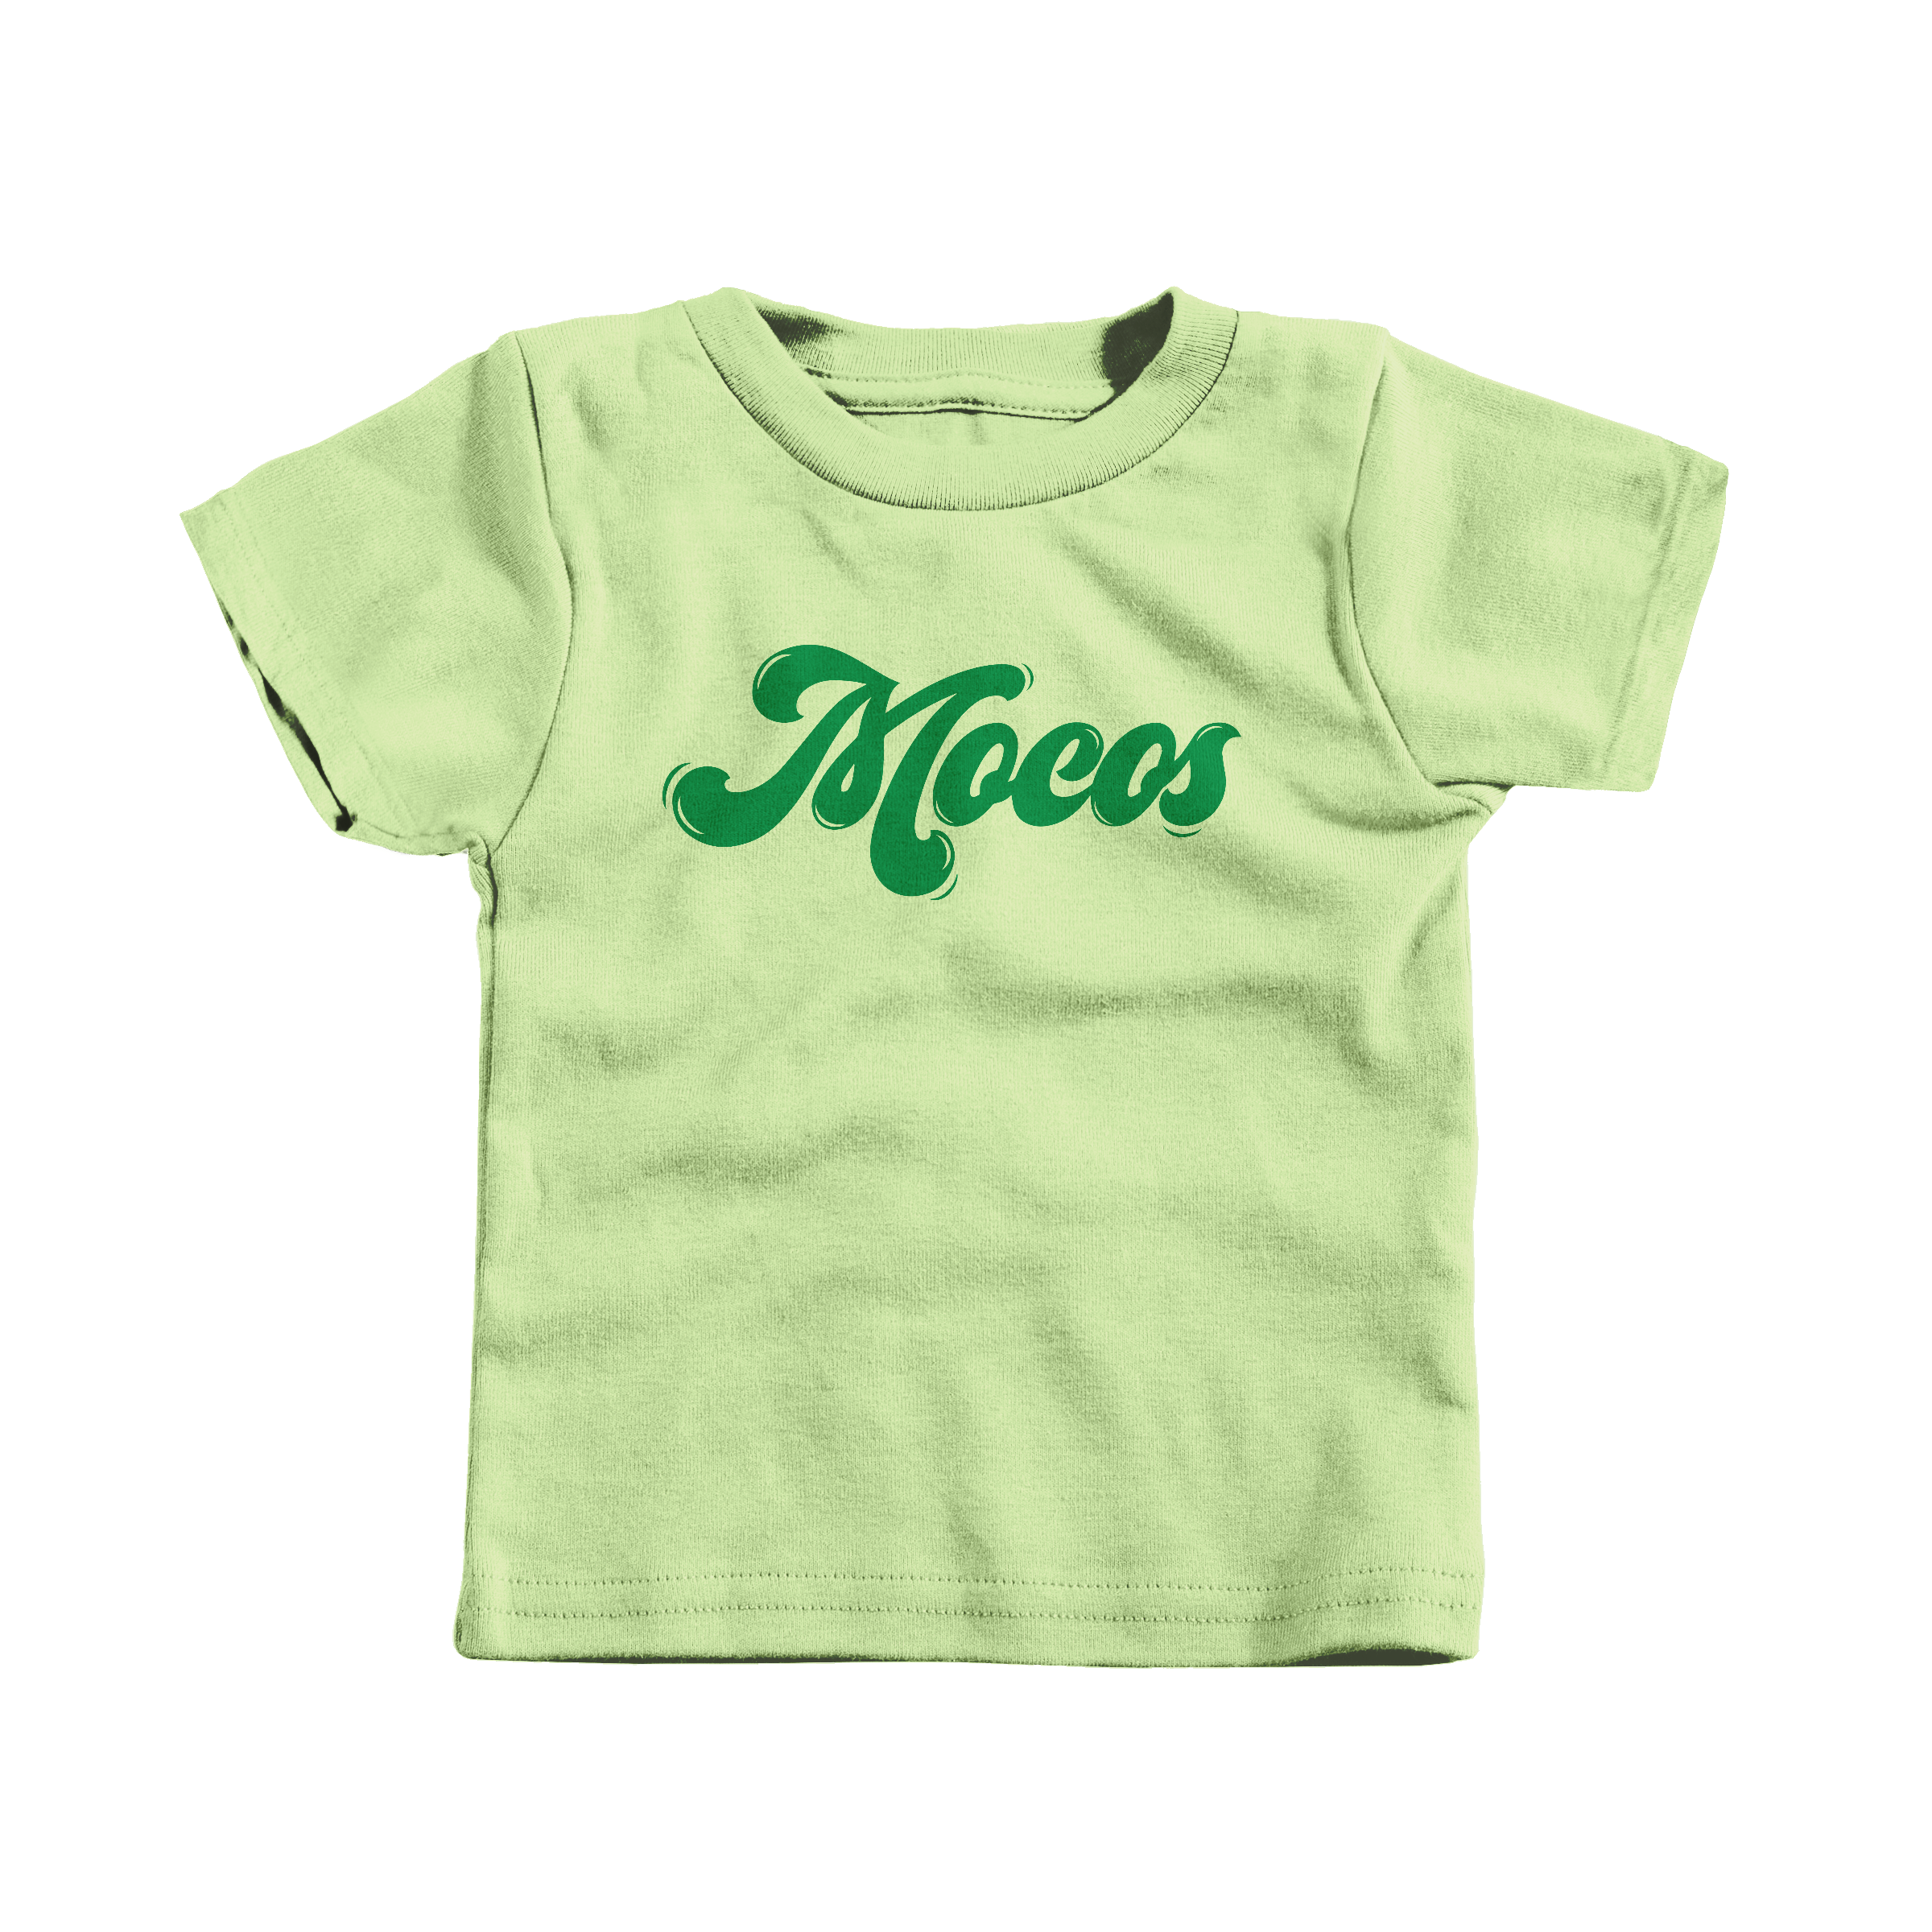 Mocos Key Lime (T-Shirt)